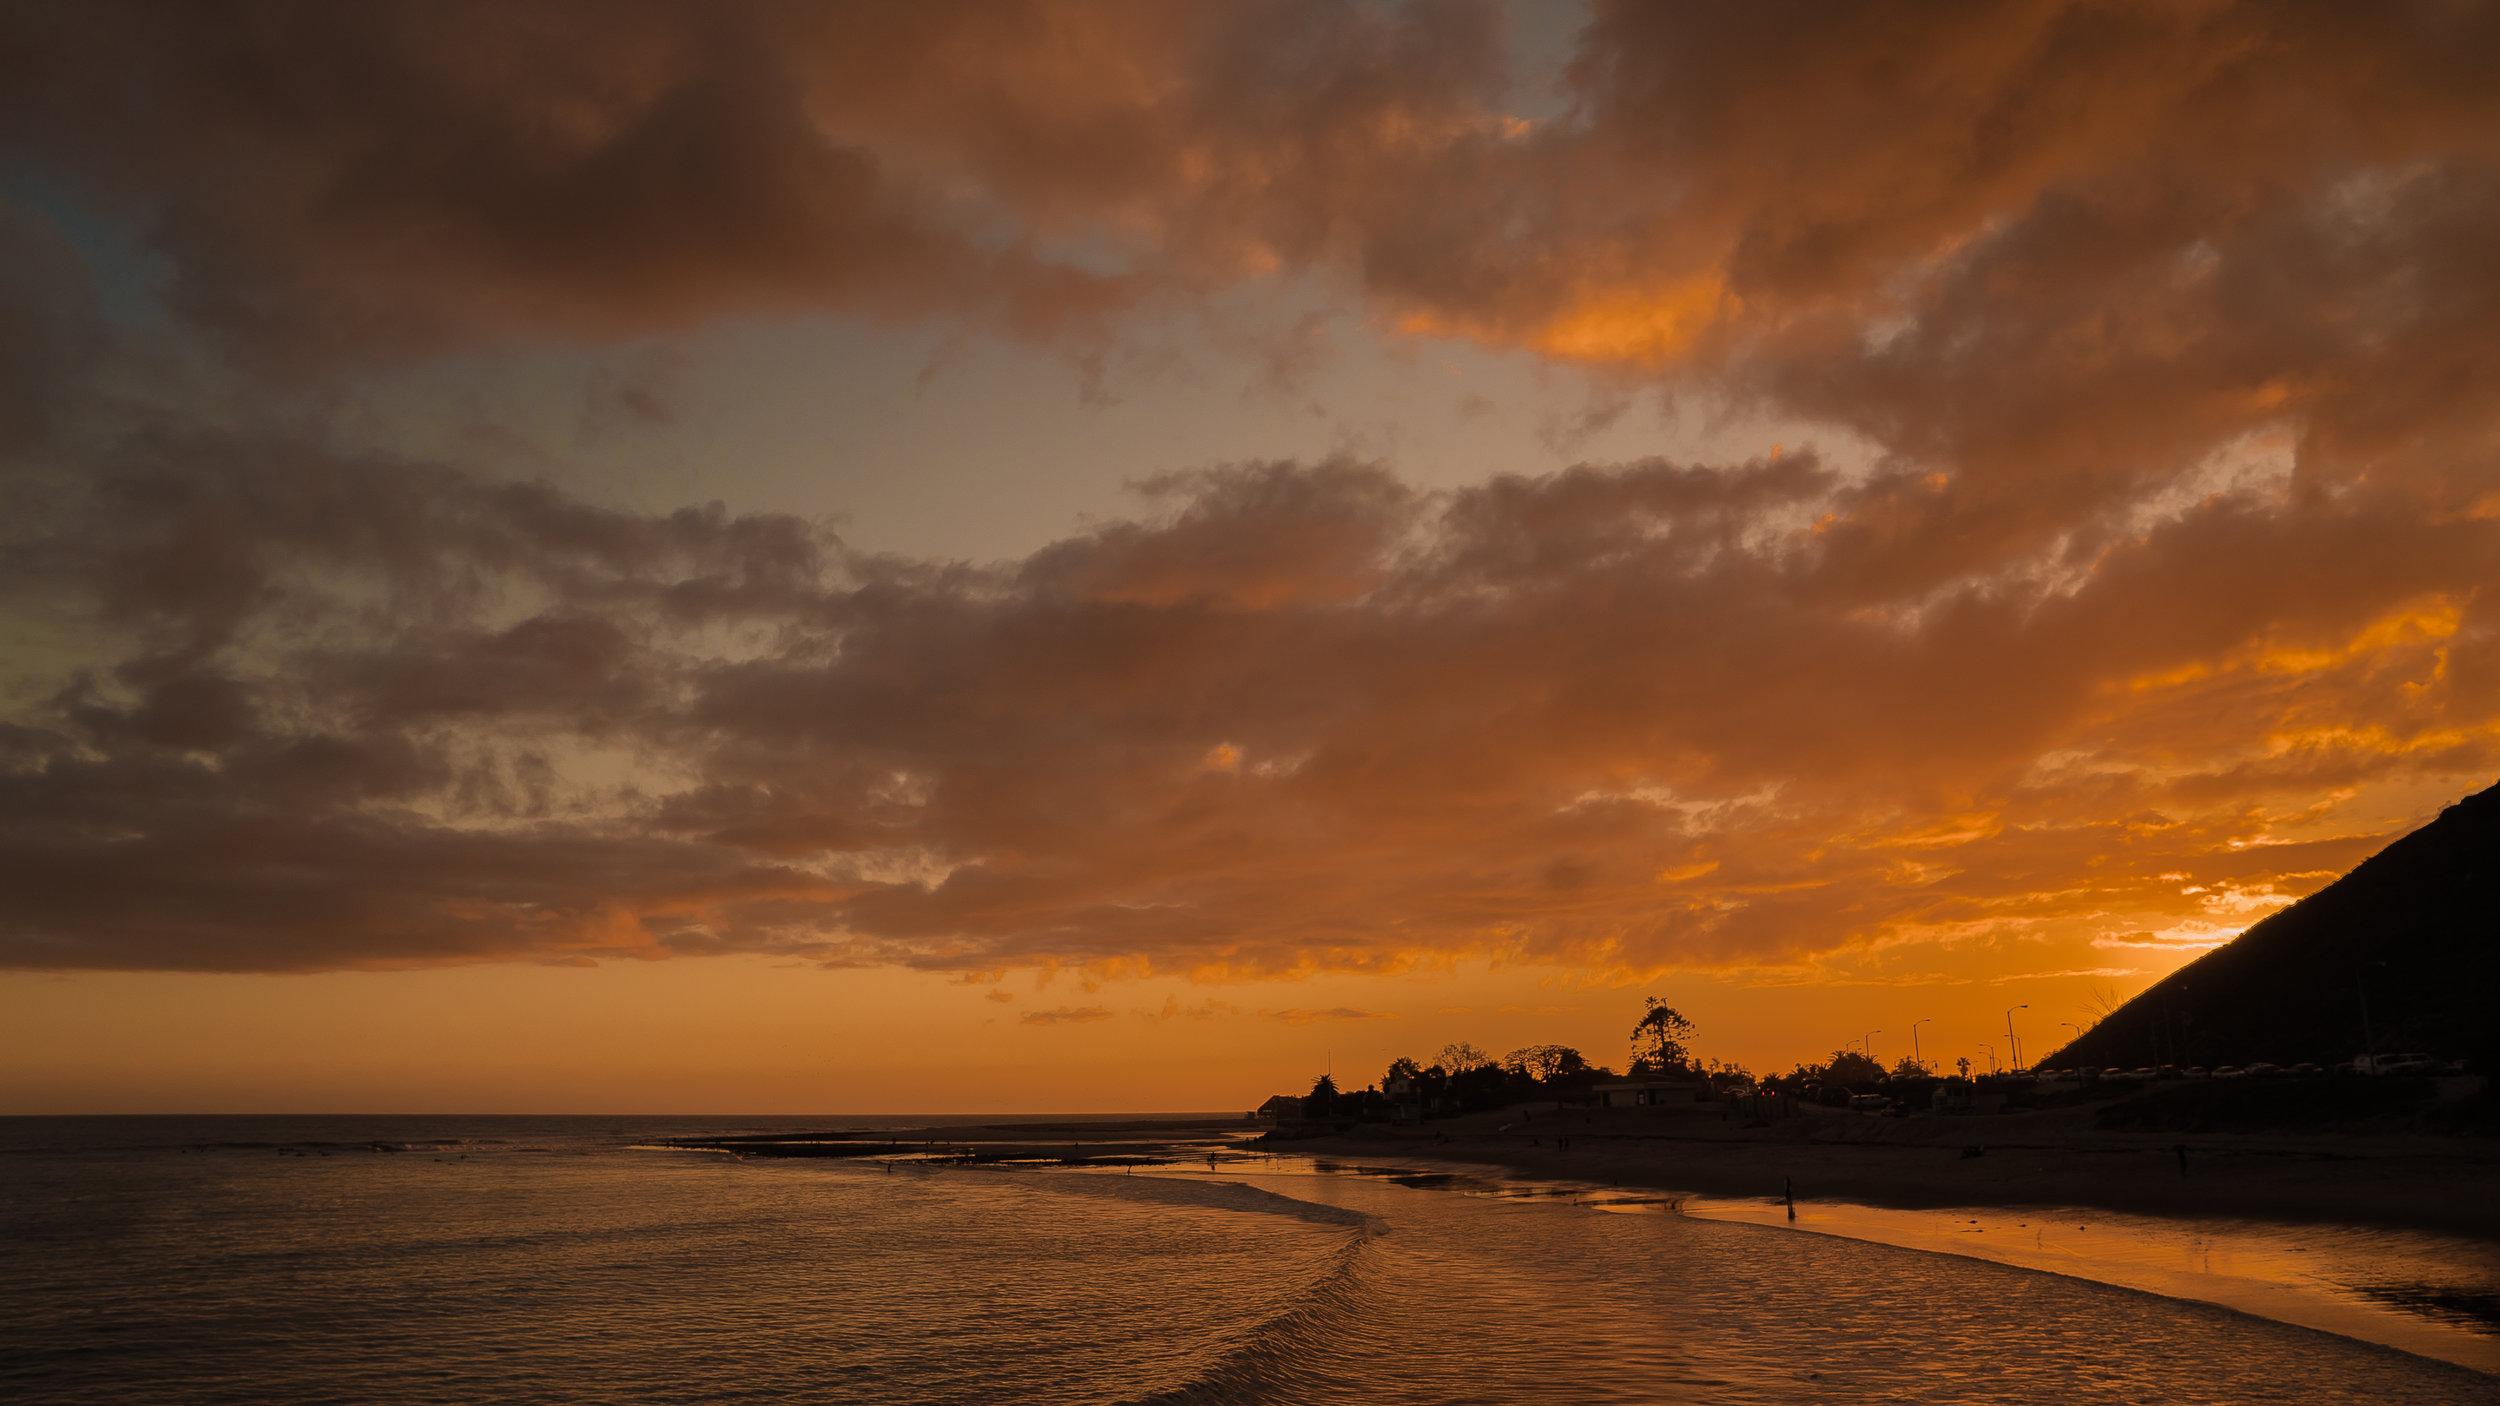 coast-of-malibu.jpg